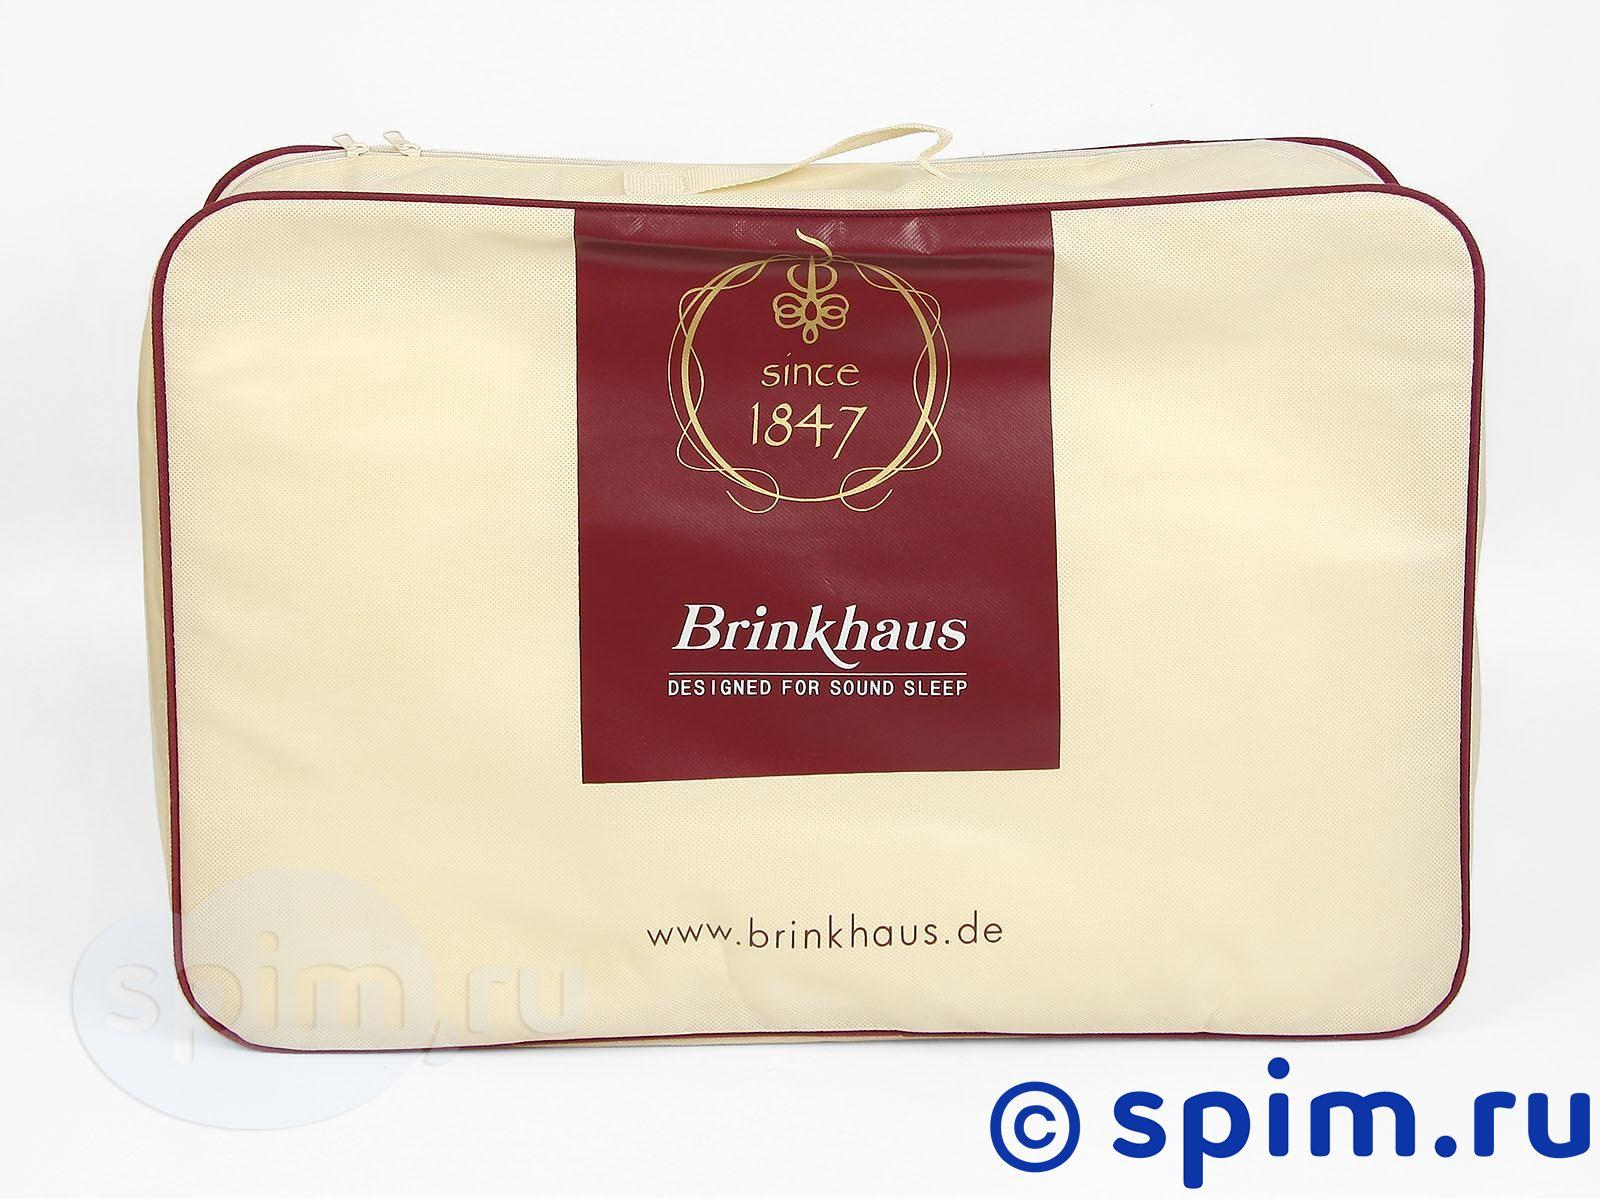 Одеяло Brinkhaus Twin Dream 200х200 см